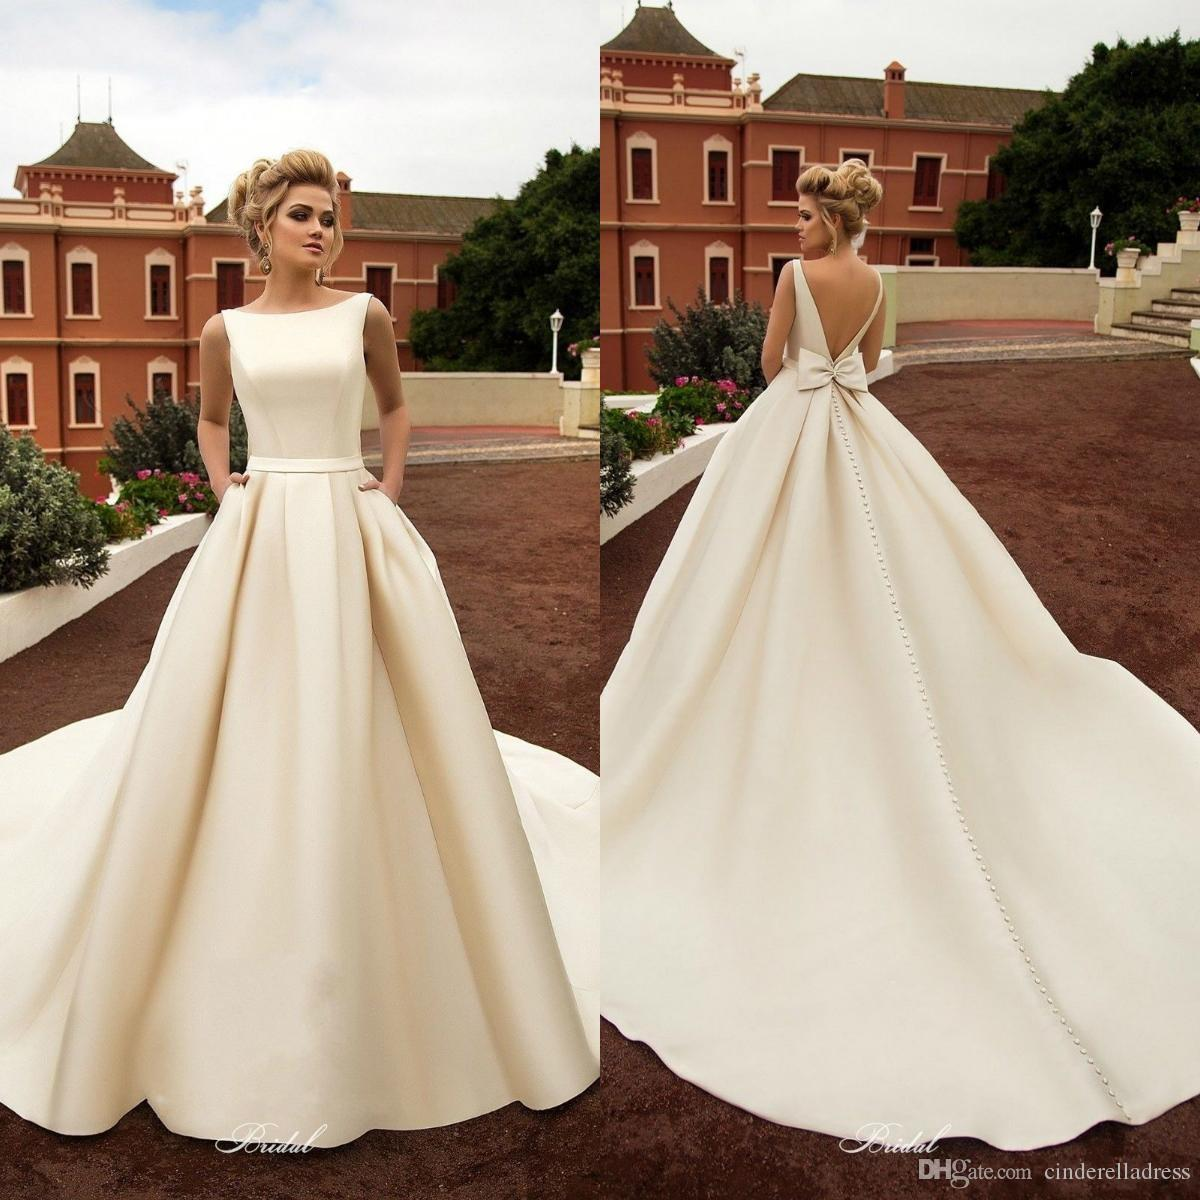 2020 New Elegant Satin Beach Wedding Dresses With Pockets Backless Bow Boho Beach A Line Backless Wedding Dress Bridal Gowns